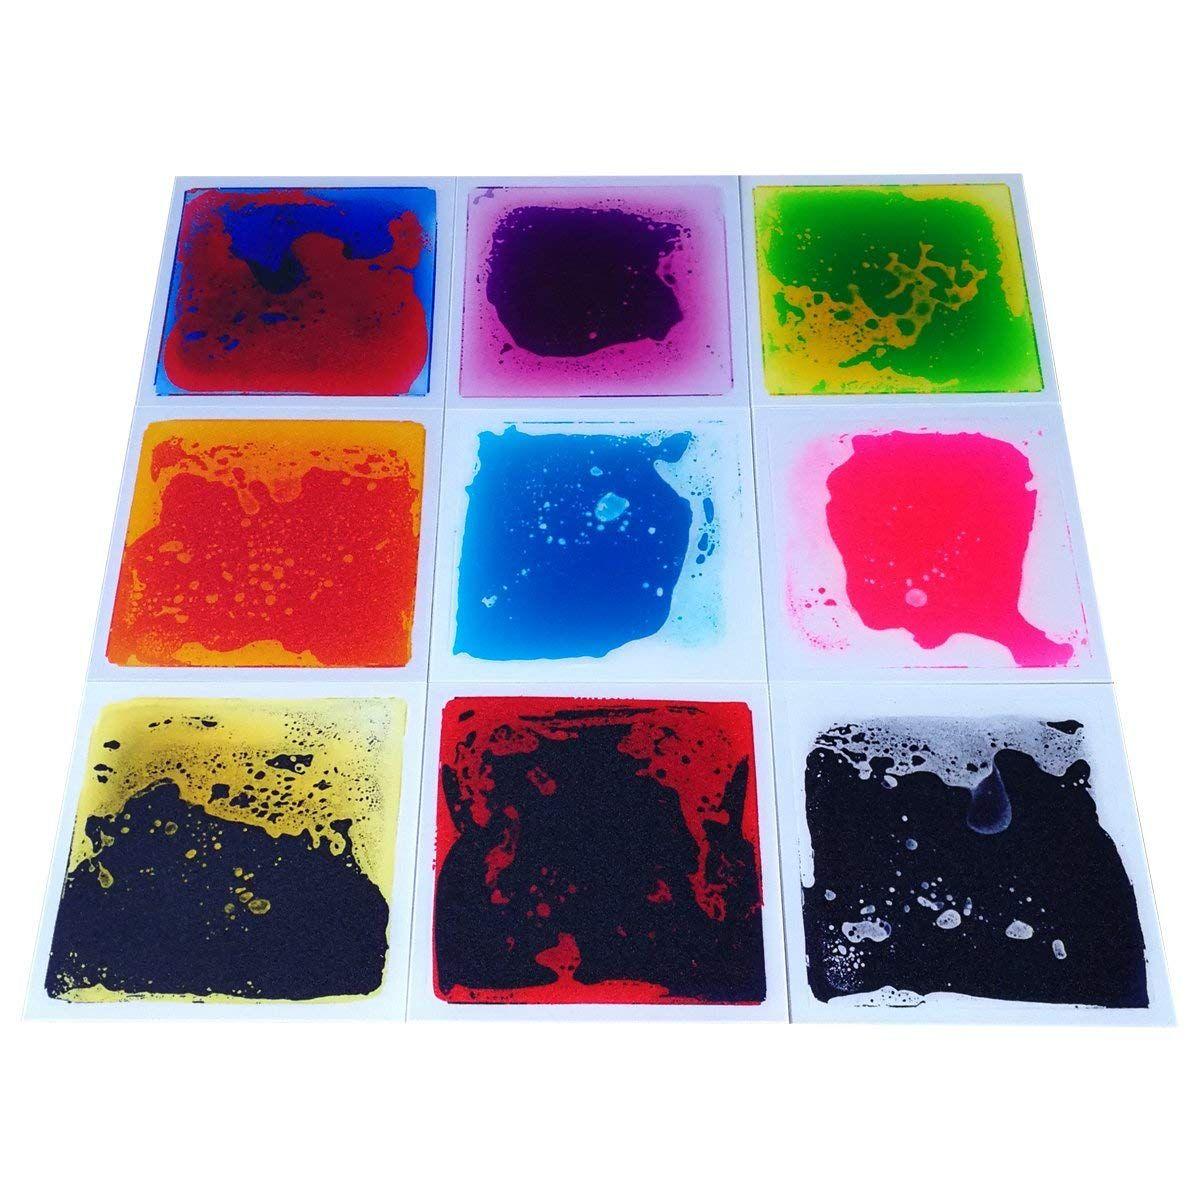 Art3d liquid fusion activity play centers for